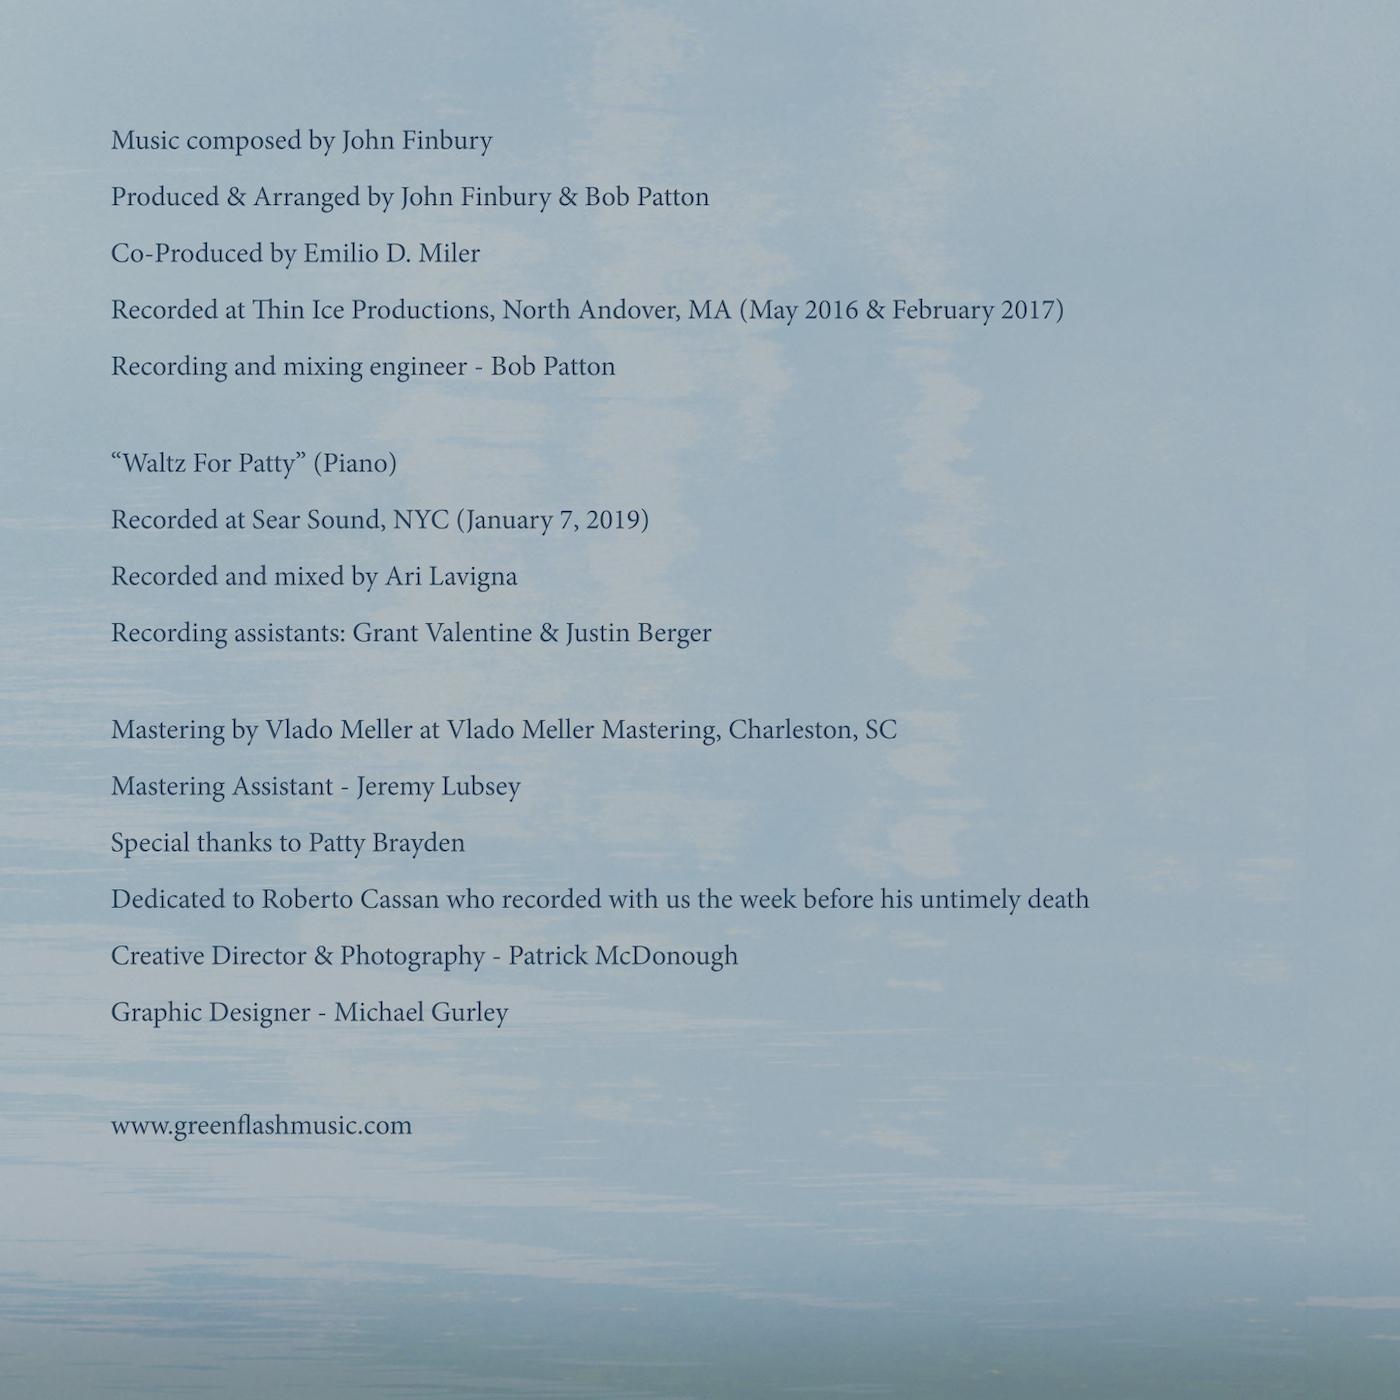 American-Nocturnes-by-John-Finbury-Album-Cover-Rear